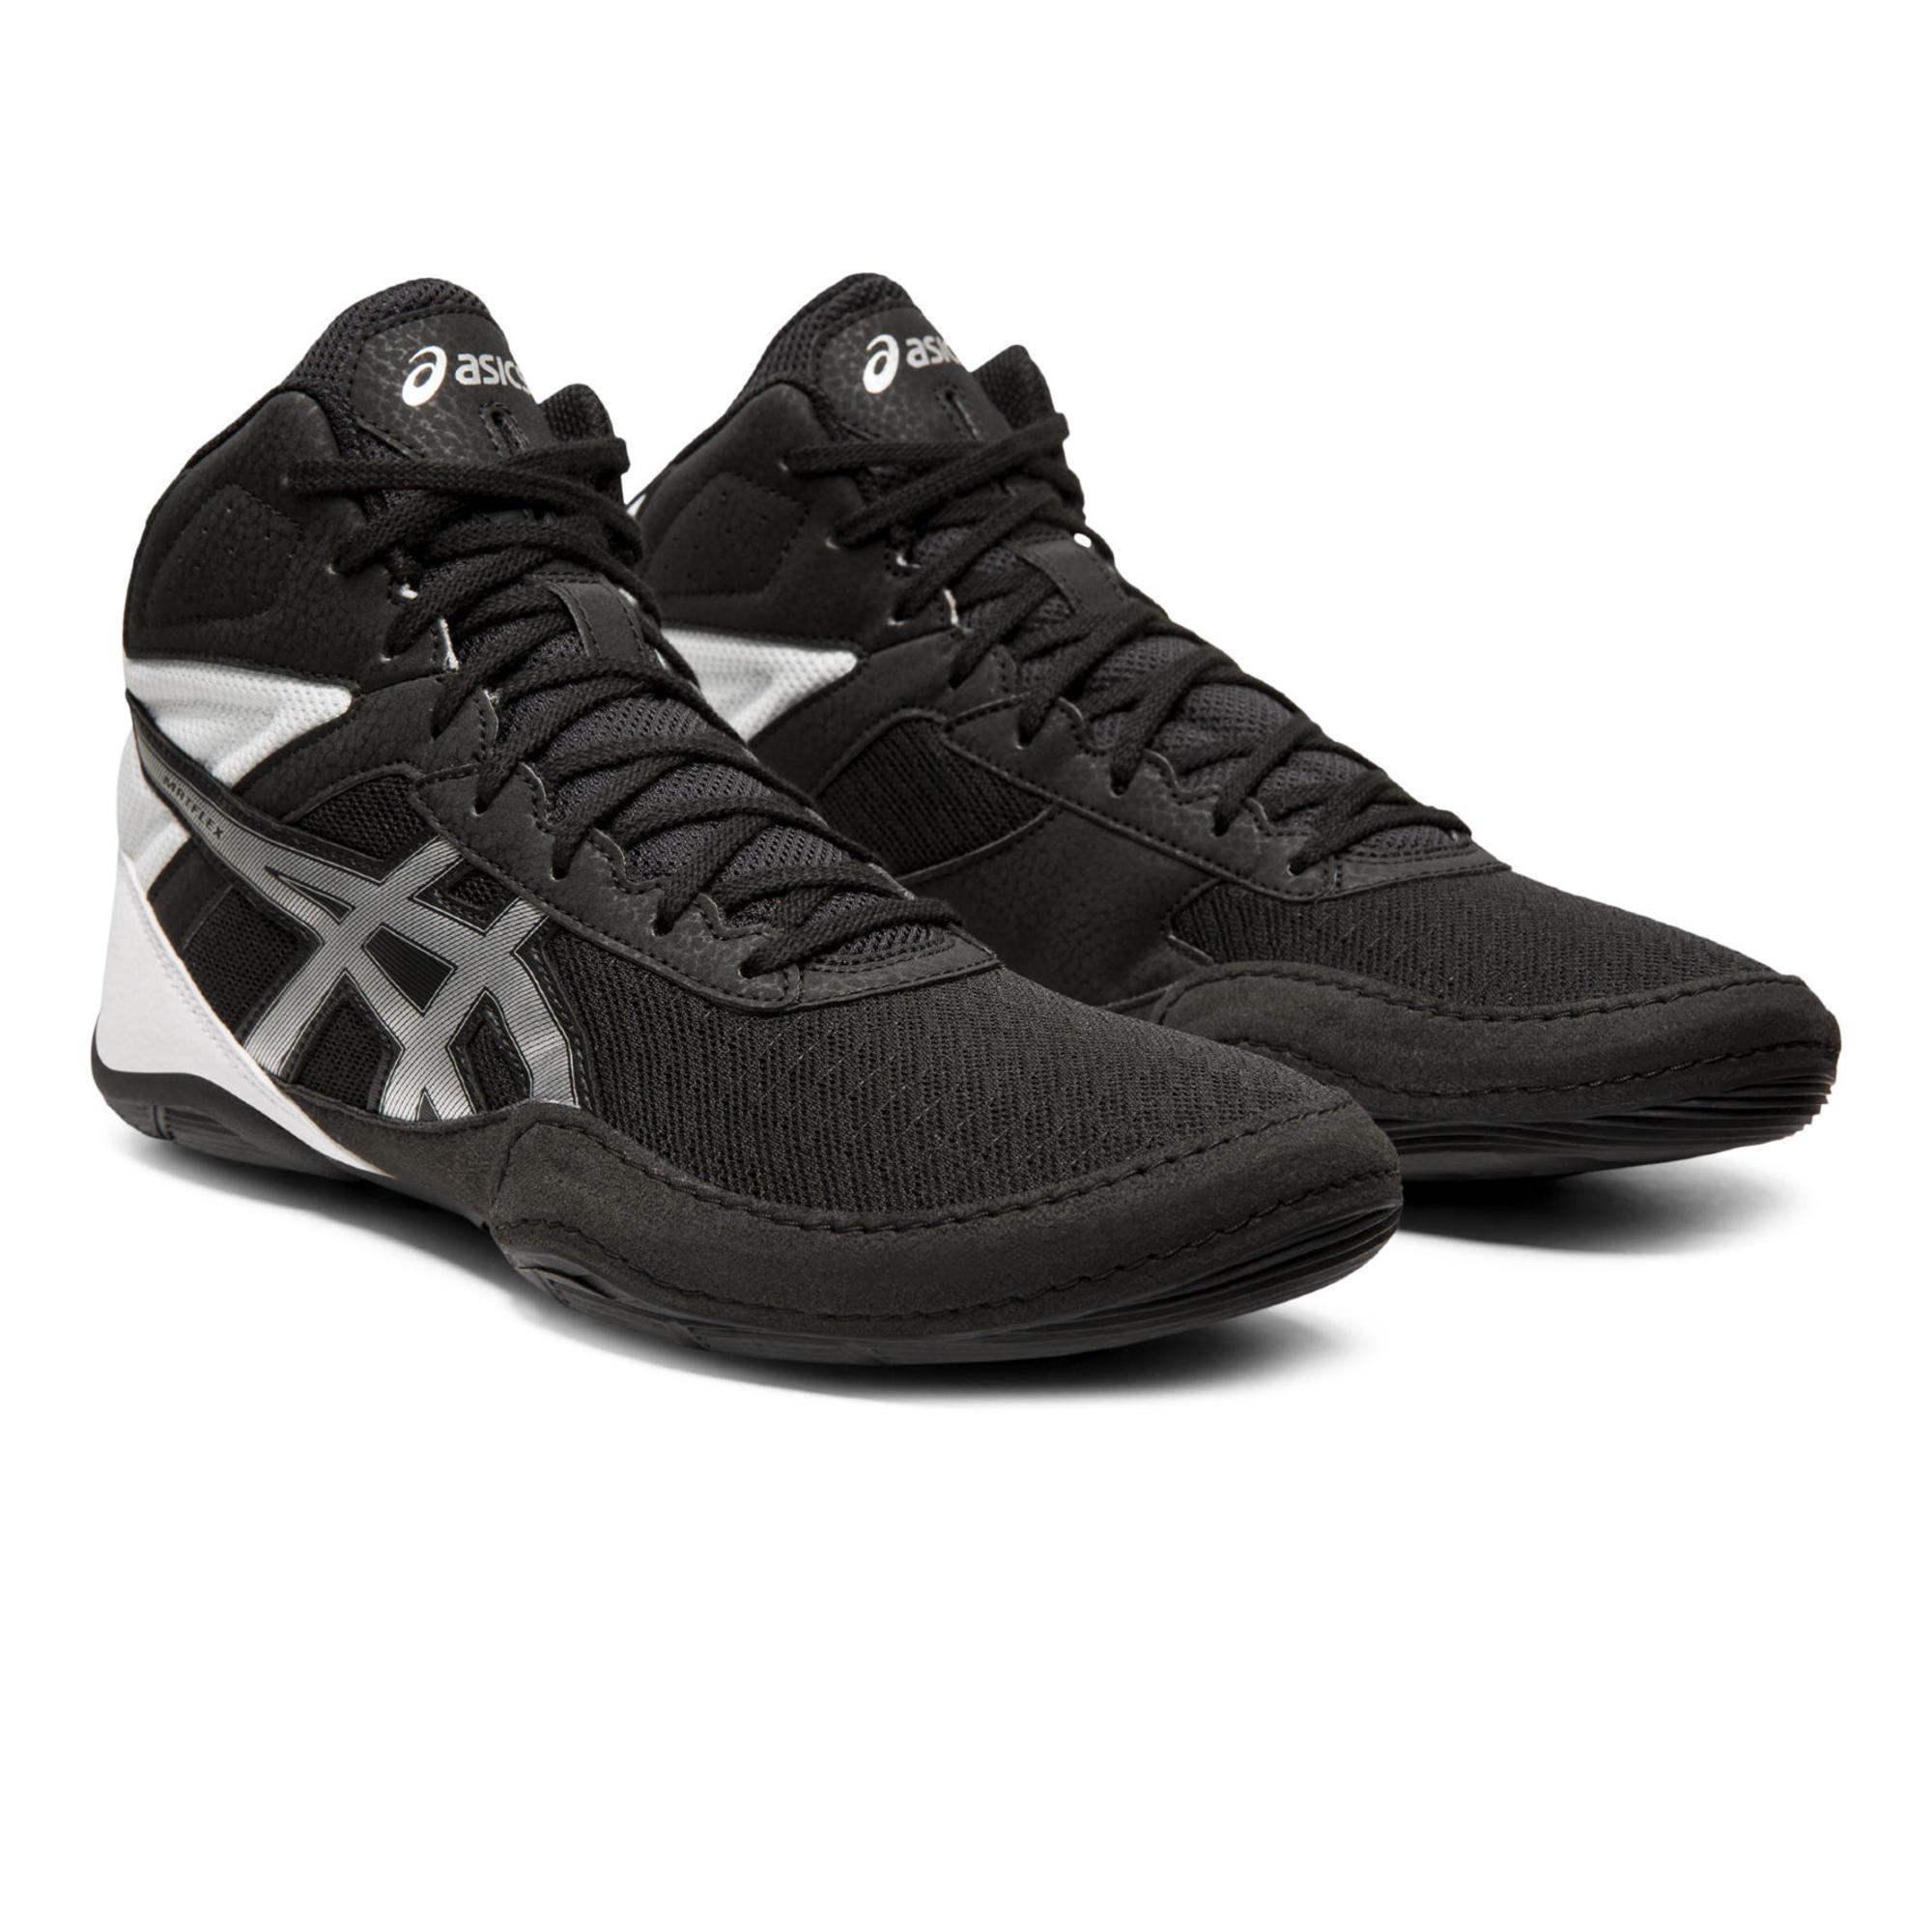 Asics Ringerschuhe| Wrestlingschuhe Matflex 6 | Schuhe > Sportschuhe > Boxschuhe | ASICS